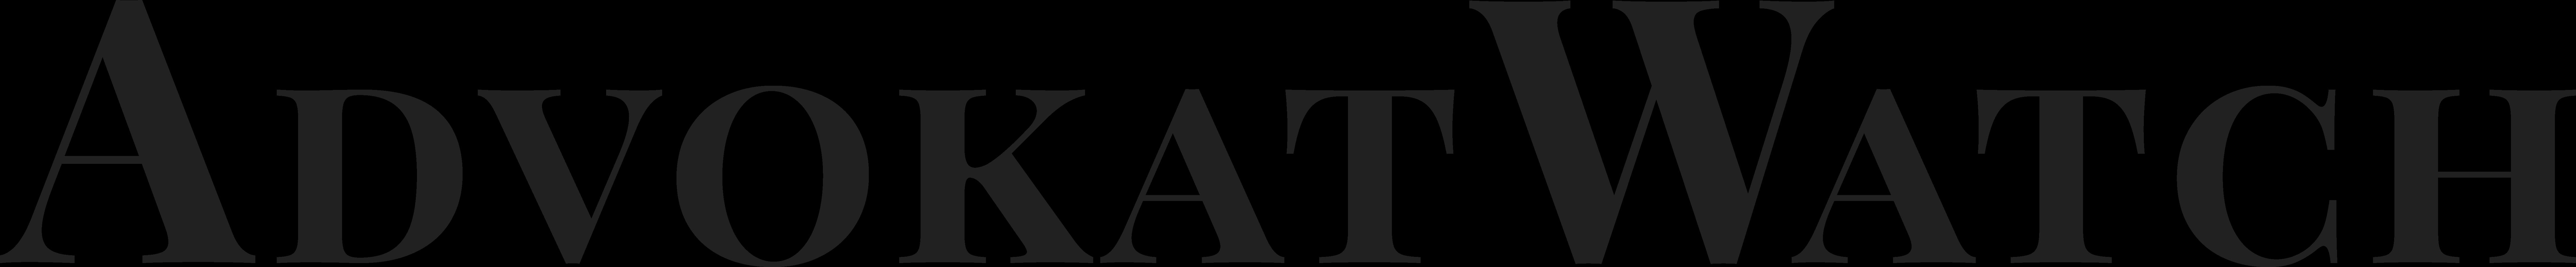 WatshMedier_Logo_AdvokatWatch